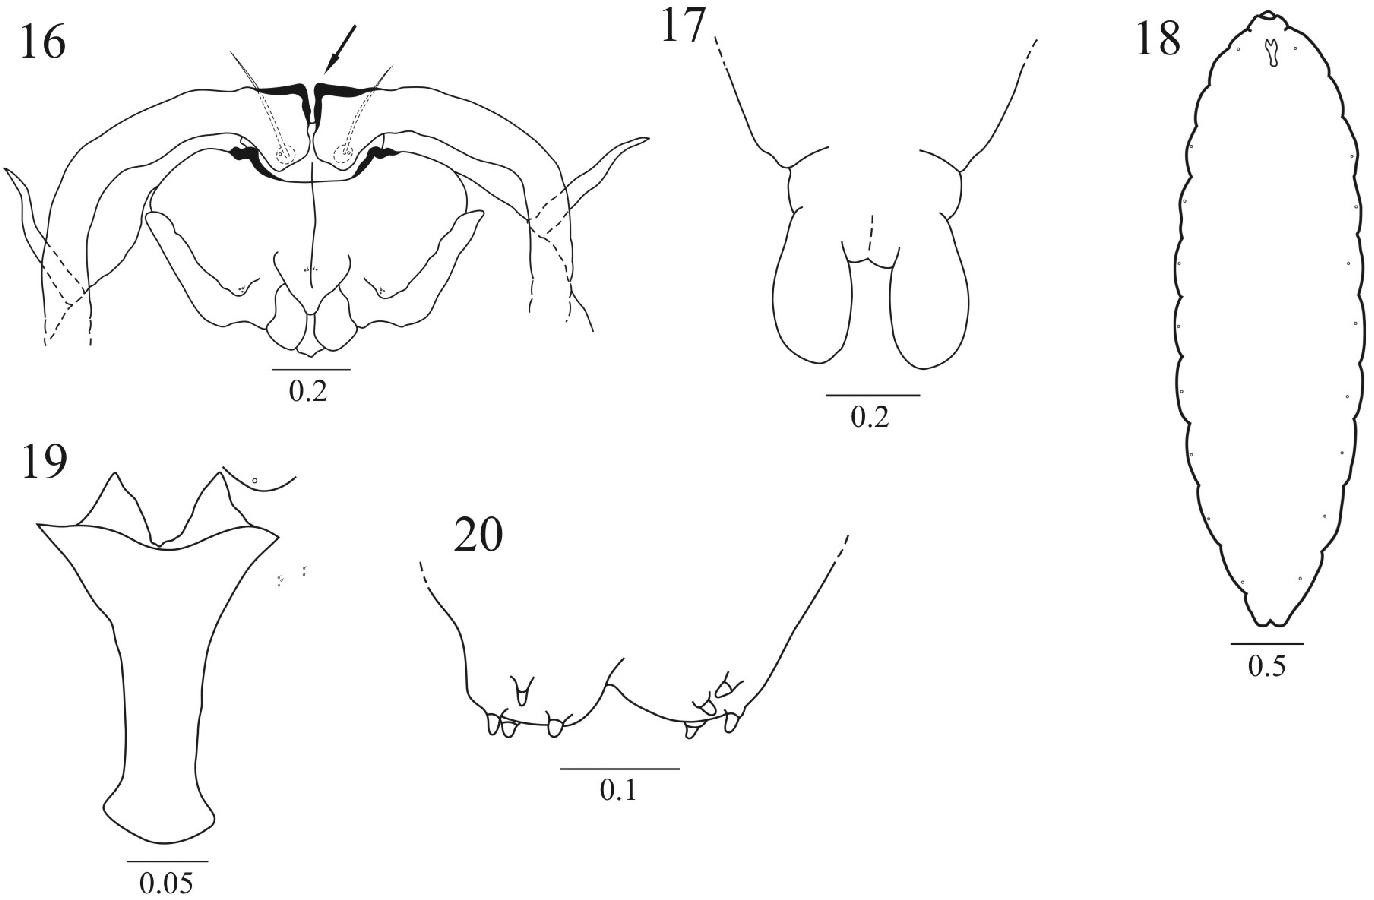 figure 13-20